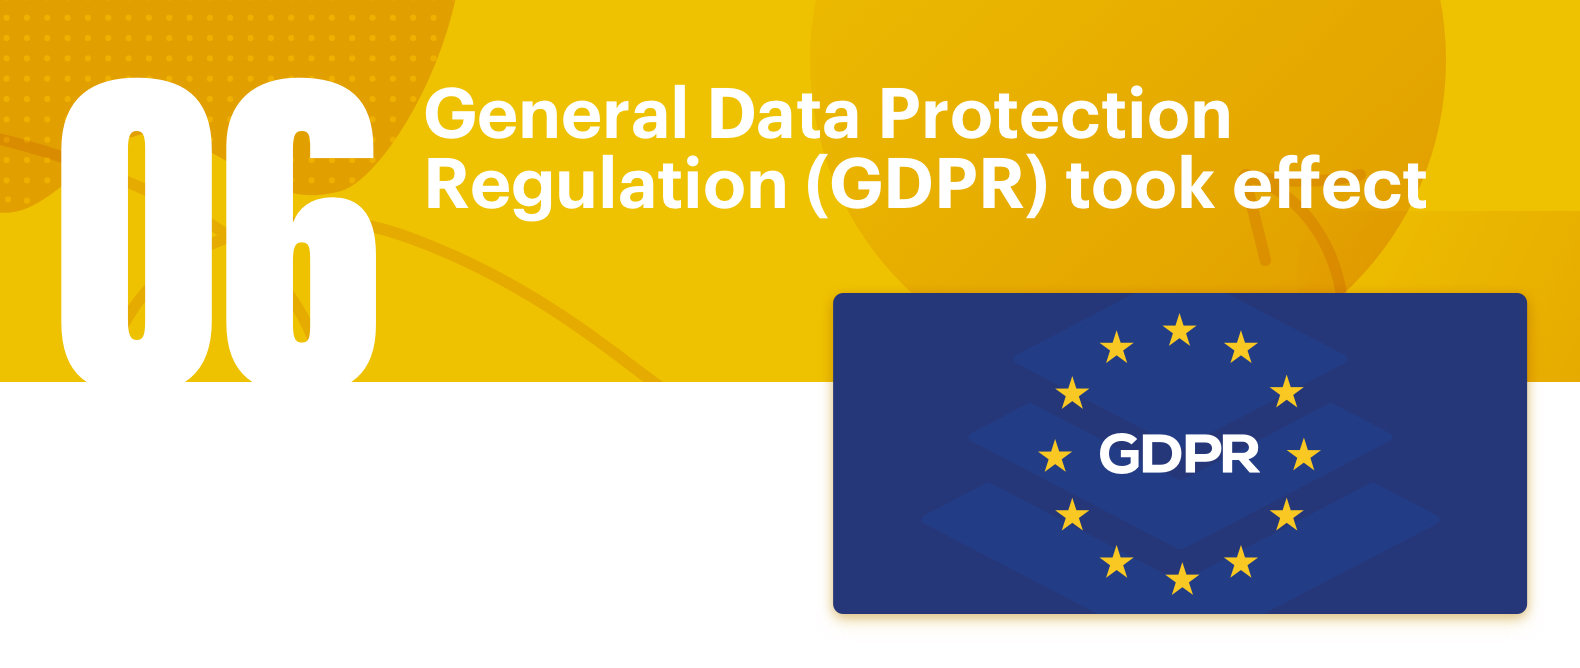 General Data Protection Regulation (GDPR) took effect